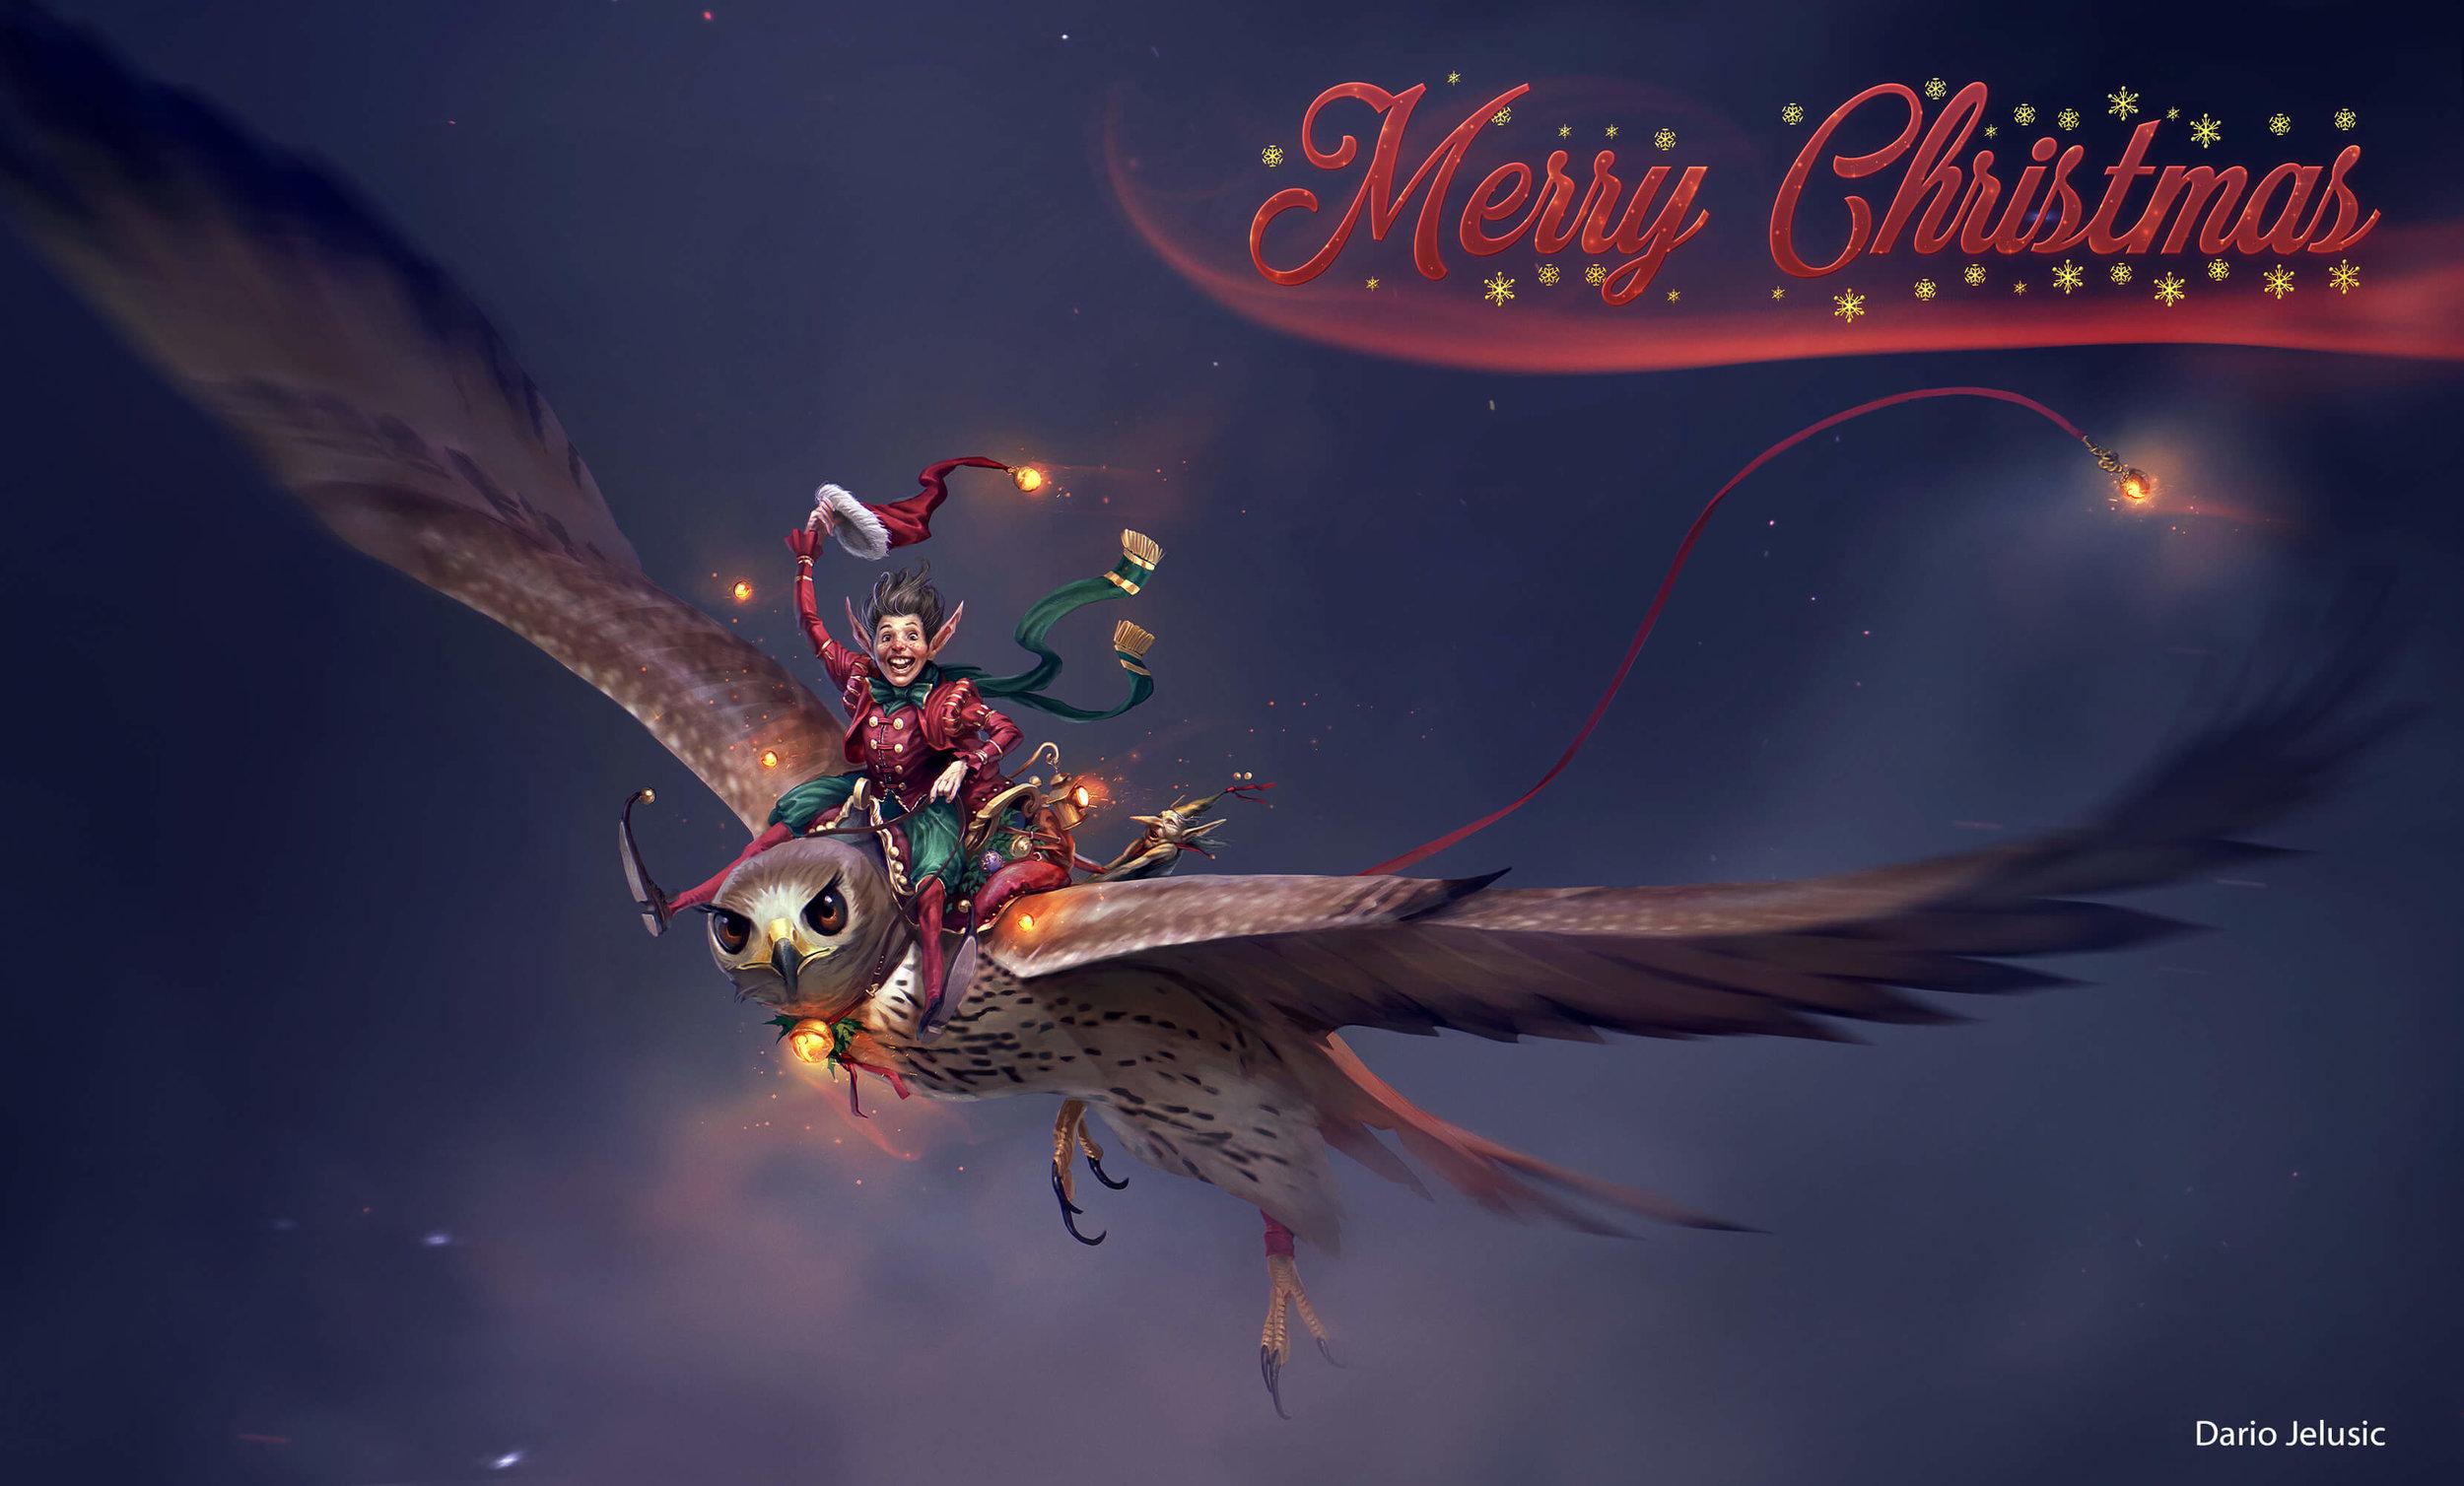 Atomhawk_News_Dec-18_Announcements_Christmas Card_Dario Jelusic.jpg